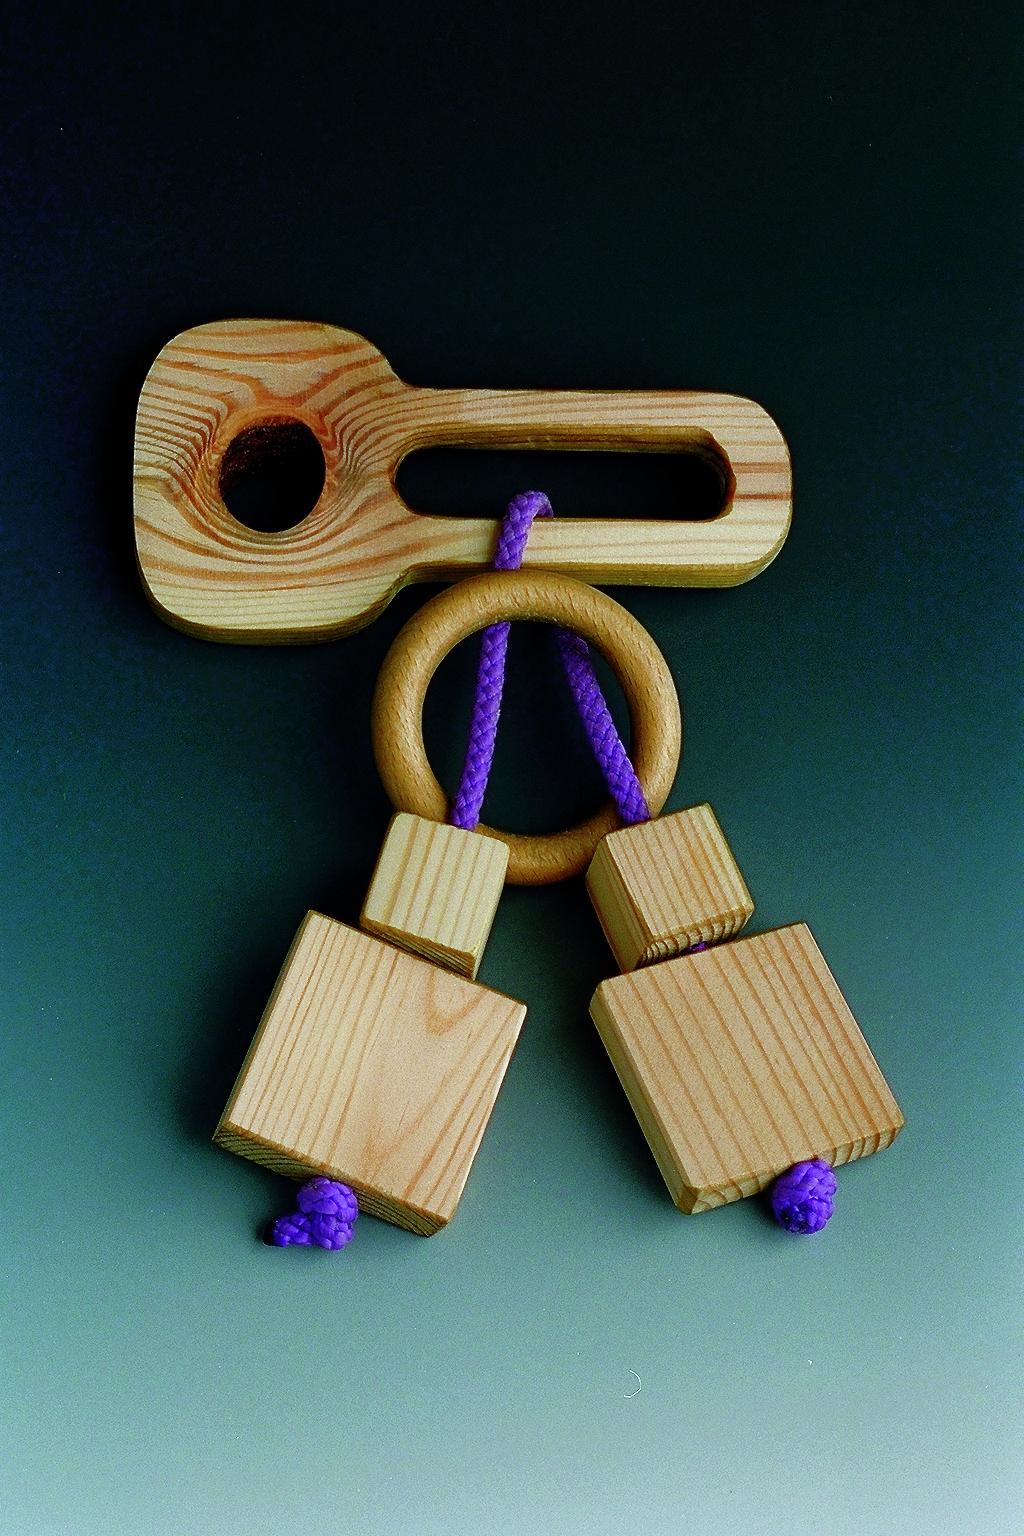 Holzspielzeug Kniffelbund LxBxH 11x6x1 cm NEU